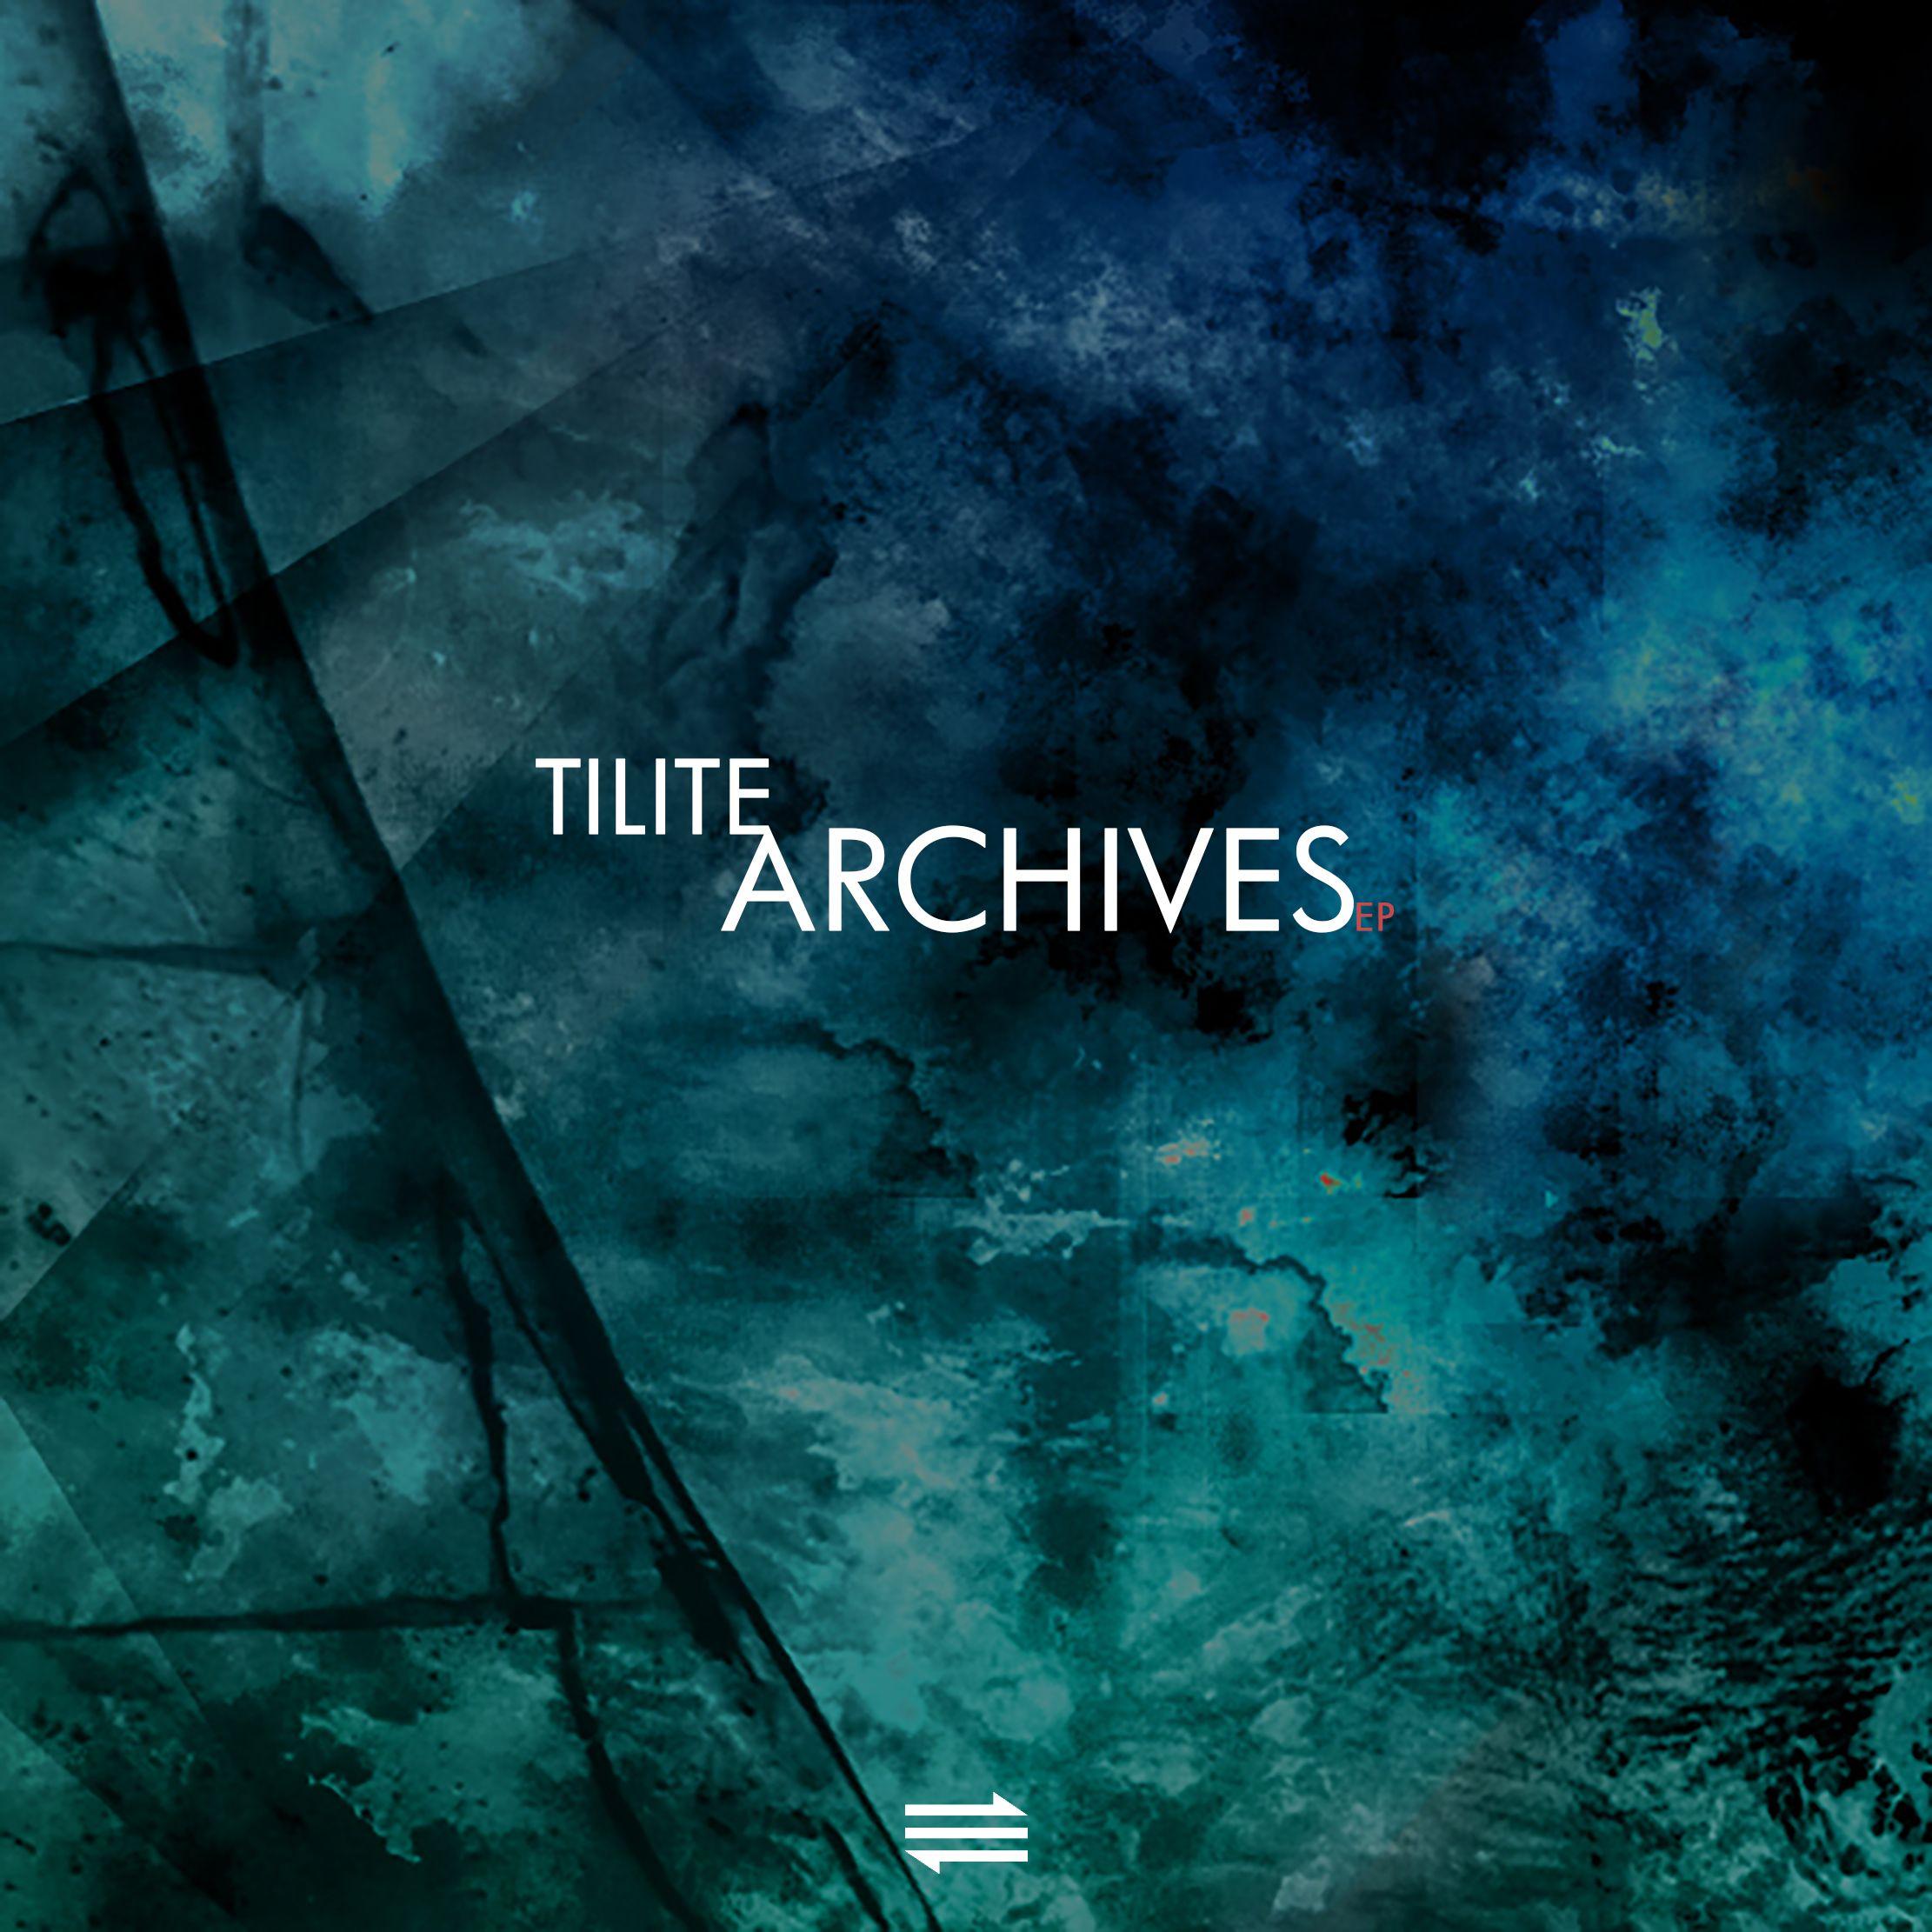 tilite_-_archive_ep.jpg